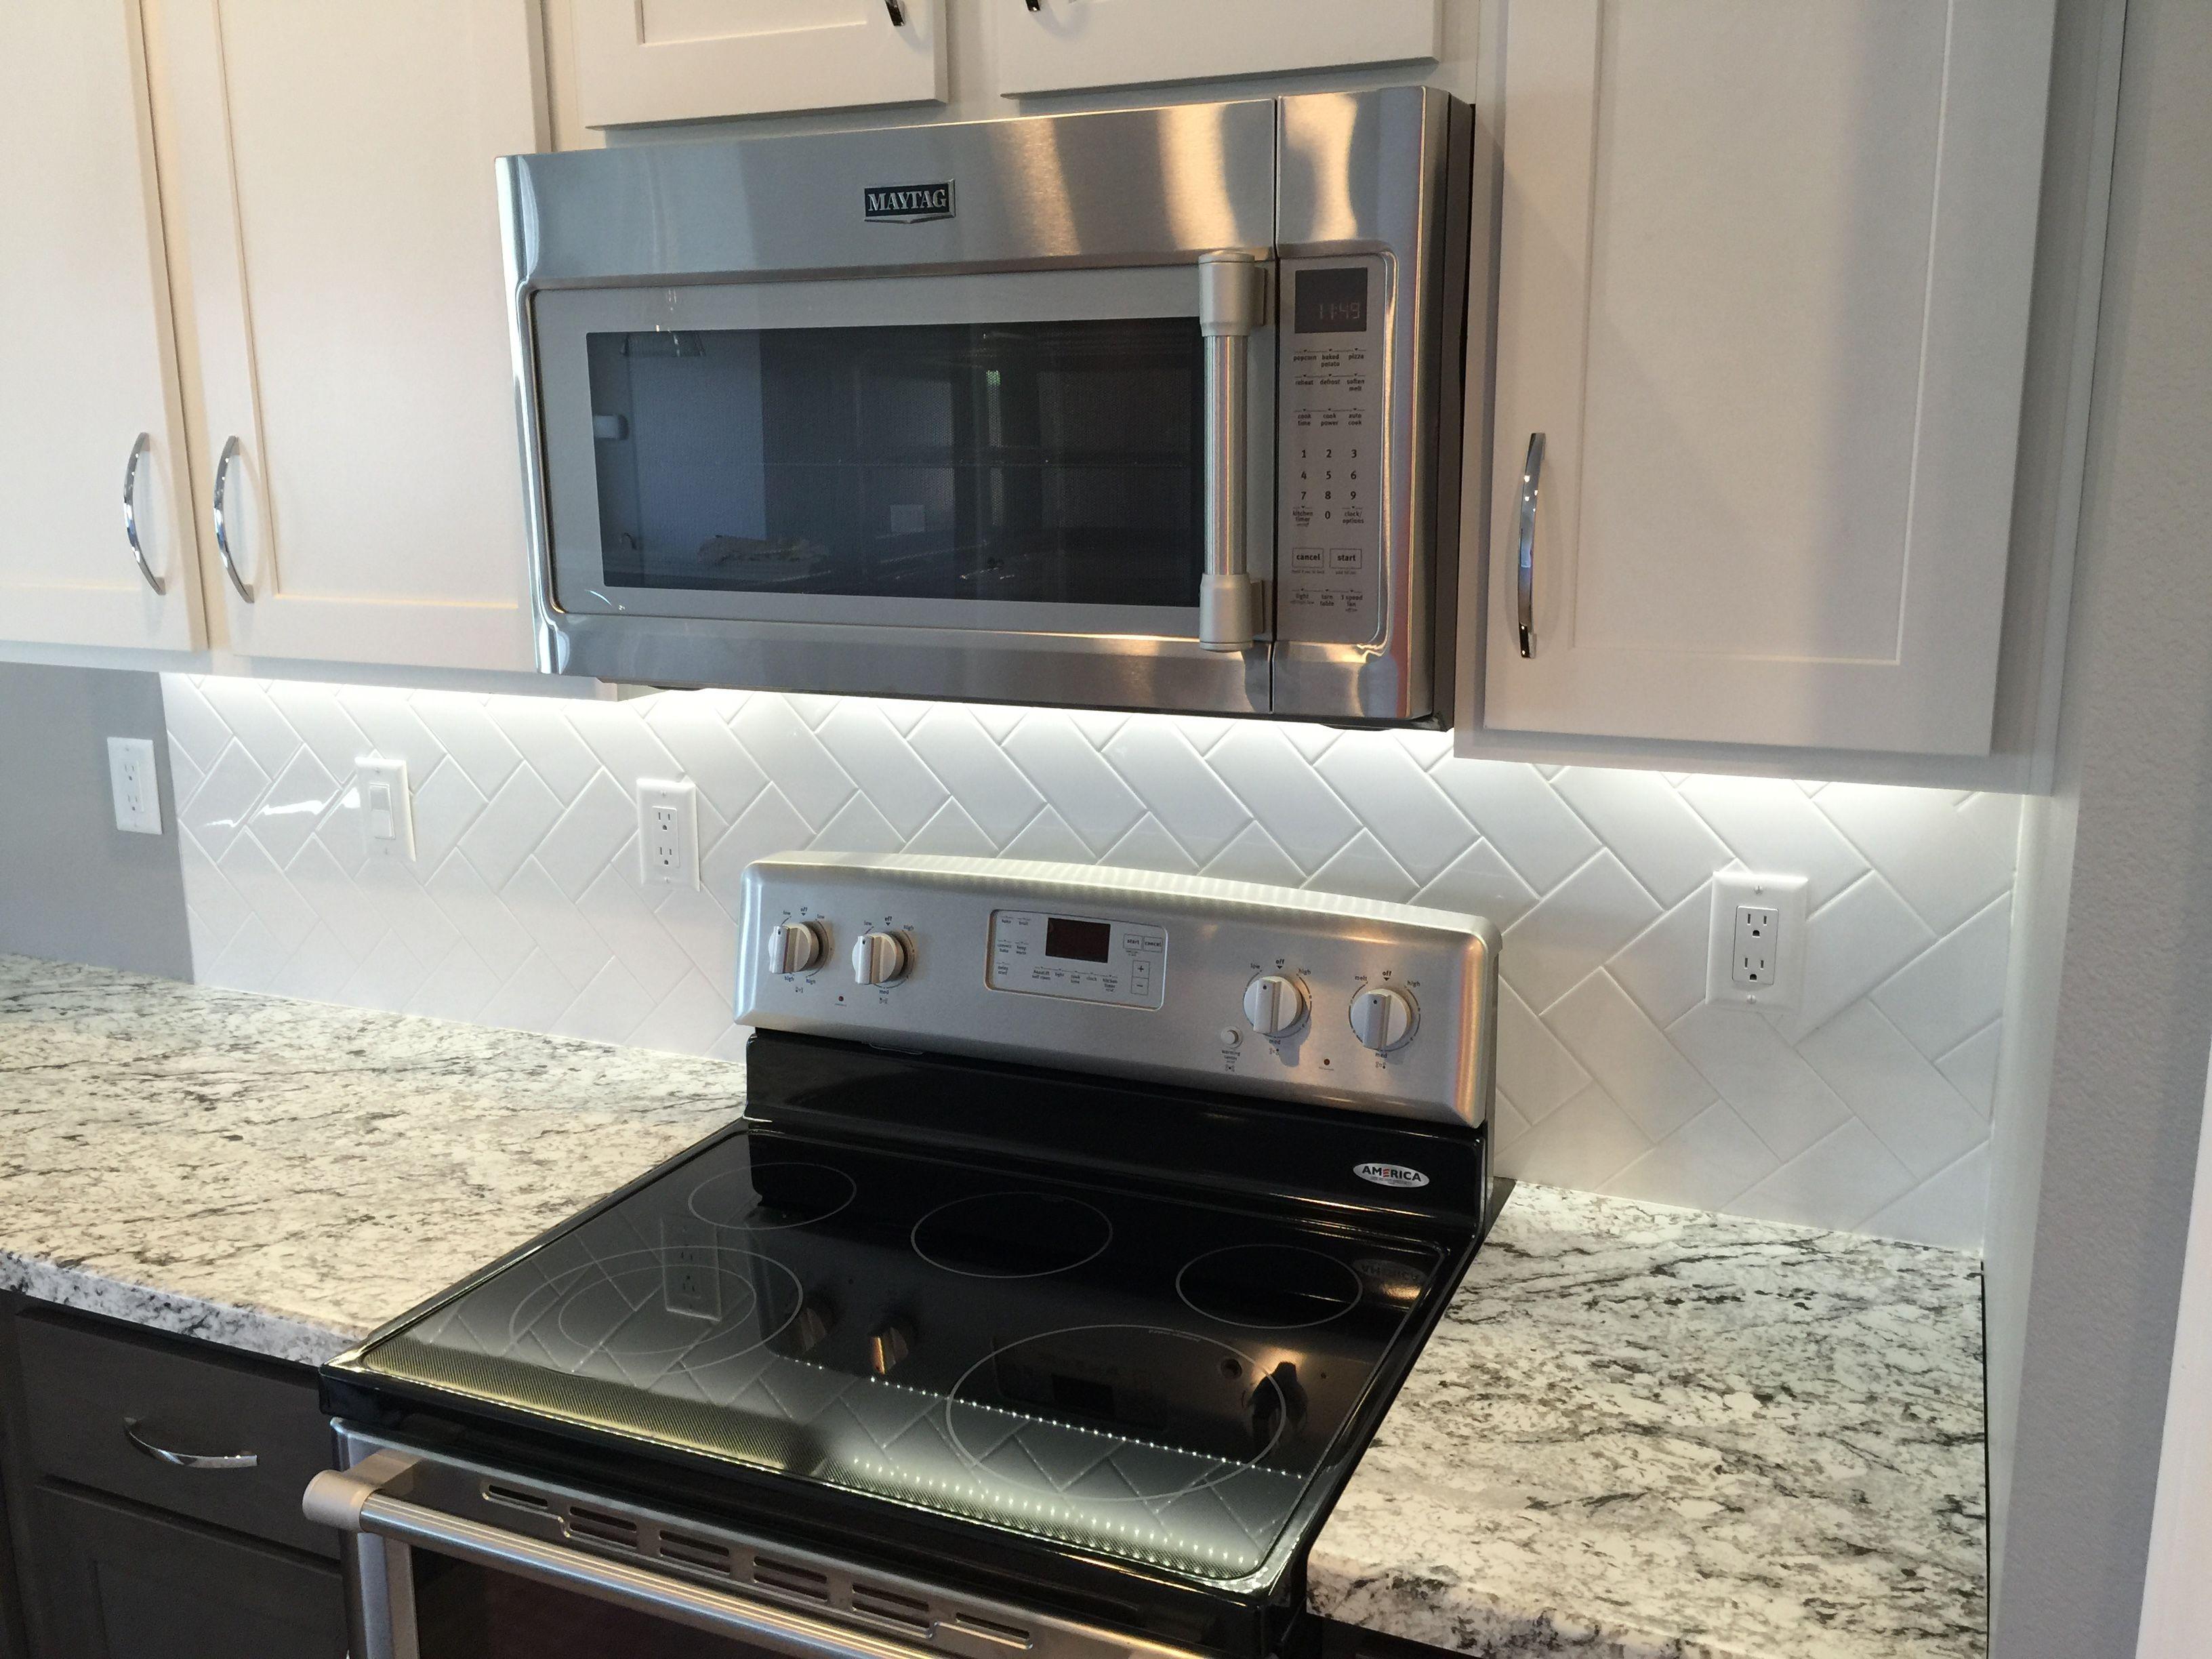 Kitchen Backsplash In A 3x6 White Subway Tile In A Vertical Herringbone Install 3x6 White Subway Tile White Subway Tile Kitchen Backsplash